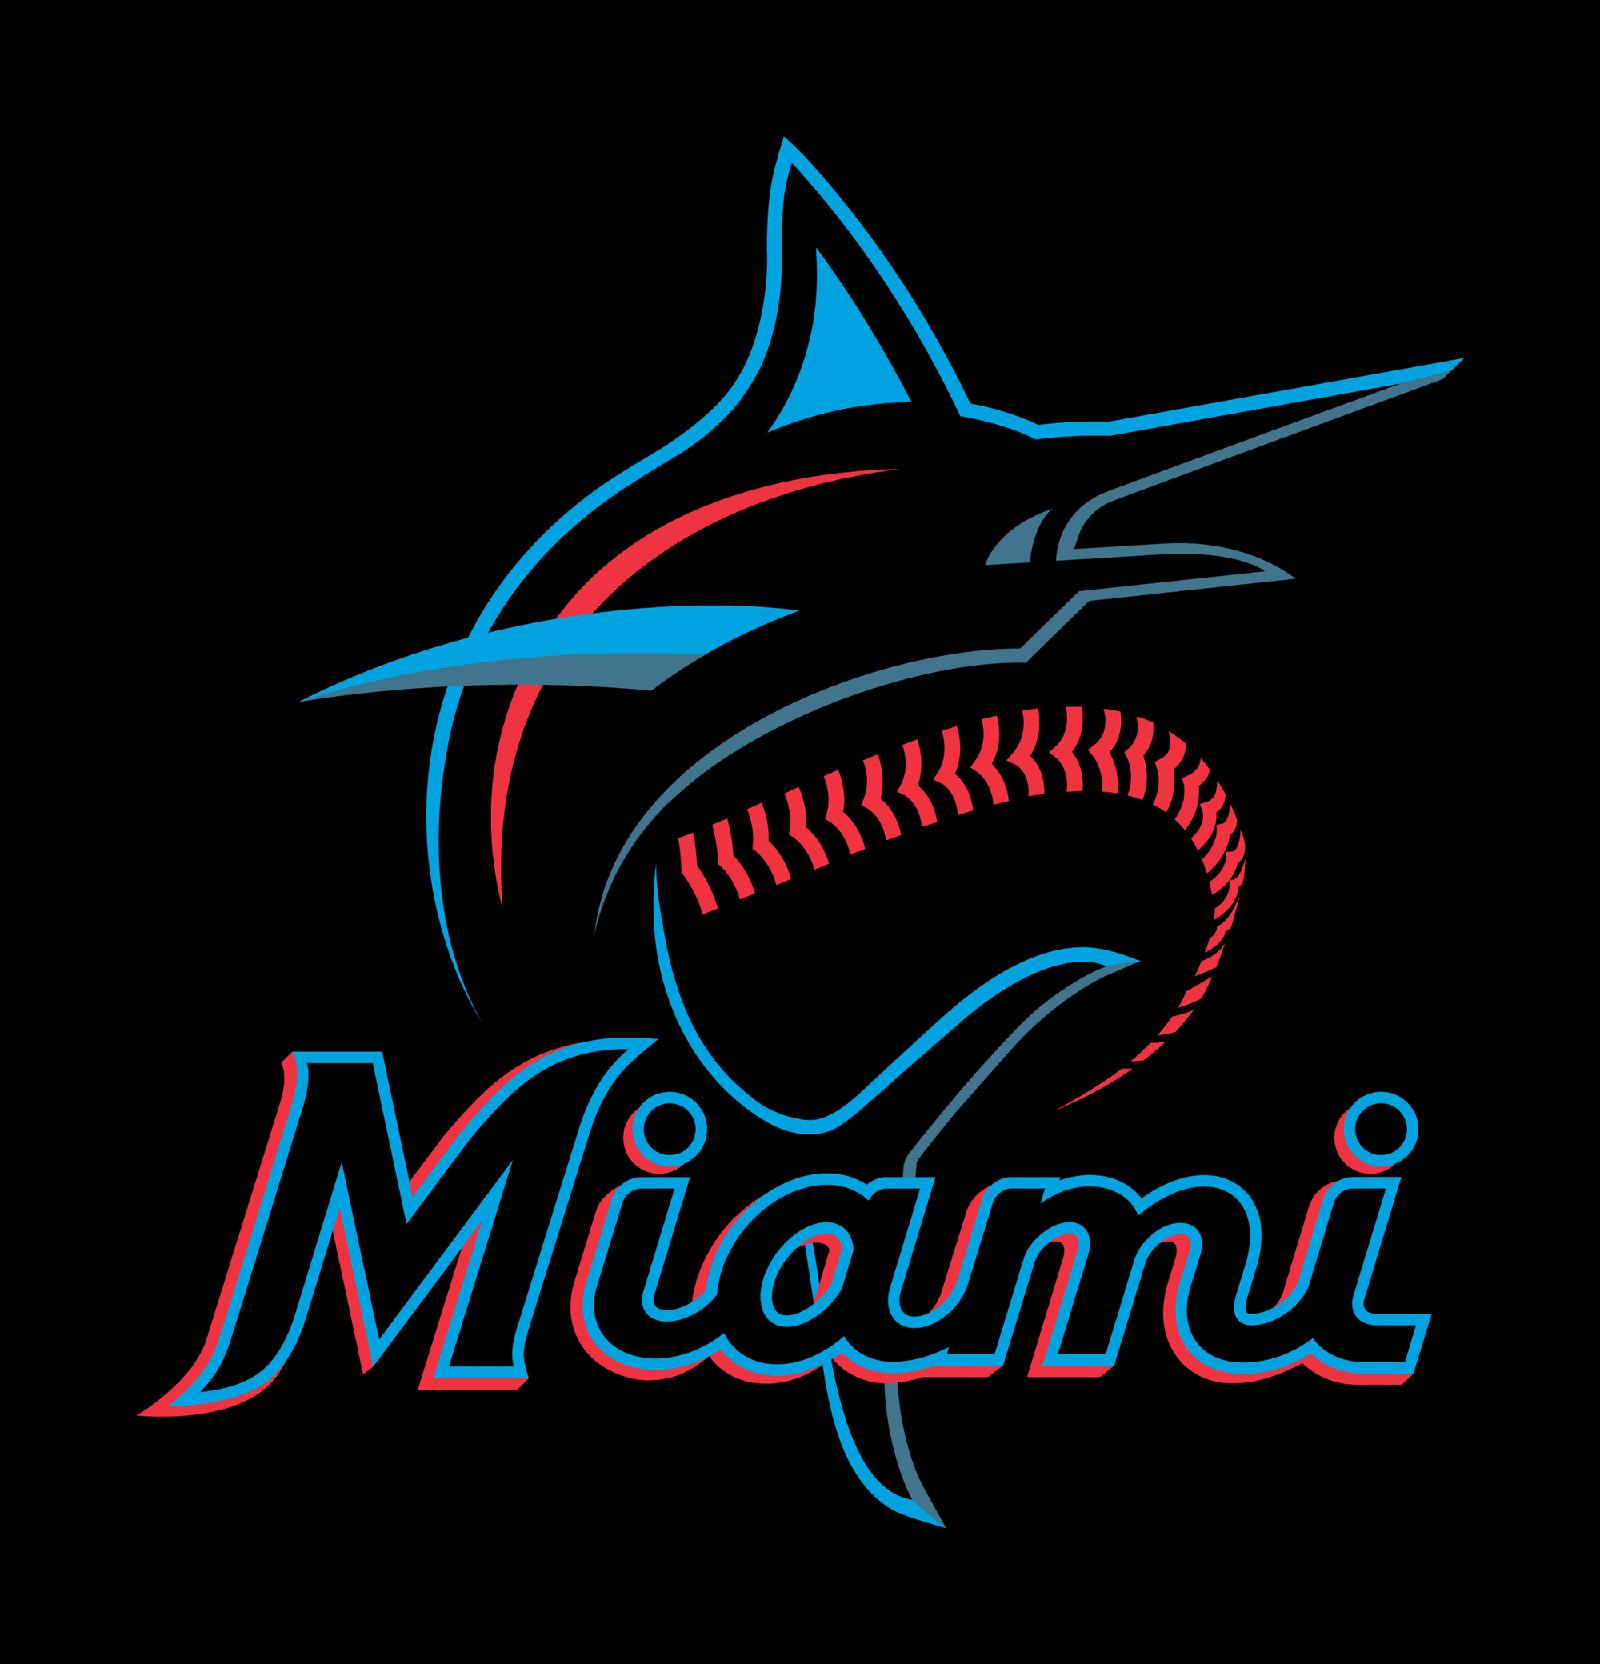 Miami Marlins迈哈密马林鱼棒球联盟启动新LOGO-VI设计2